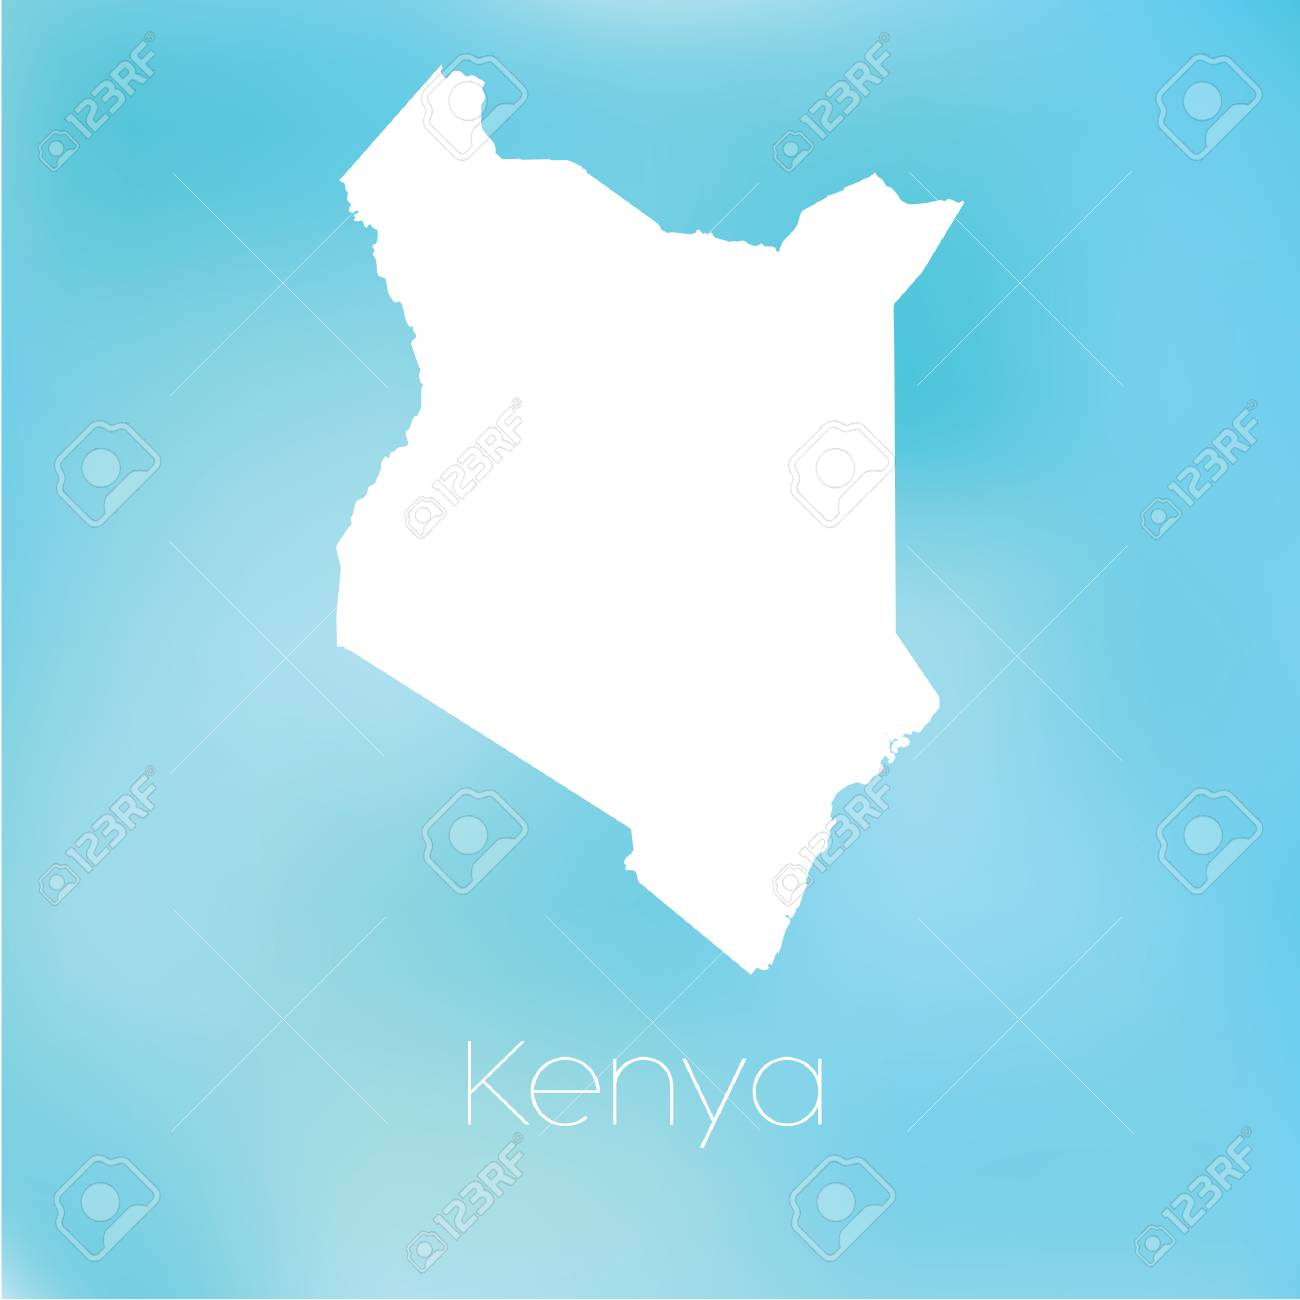 A Map of the country of Kenya Kenya Country Map on kenya map detailed, kenya's map, kenya physical features, texas natural resources map, kenya road map, lesotho capital map, kenya county map, kenya flag, african kenya map, kenya vegetation map, kenya town map, kenya country people, kenya egypt map, kenya thematic map, kenya mountains map, kenya culture, kenya ethnic map, kenya africa, kenya industry map, kenya on map,